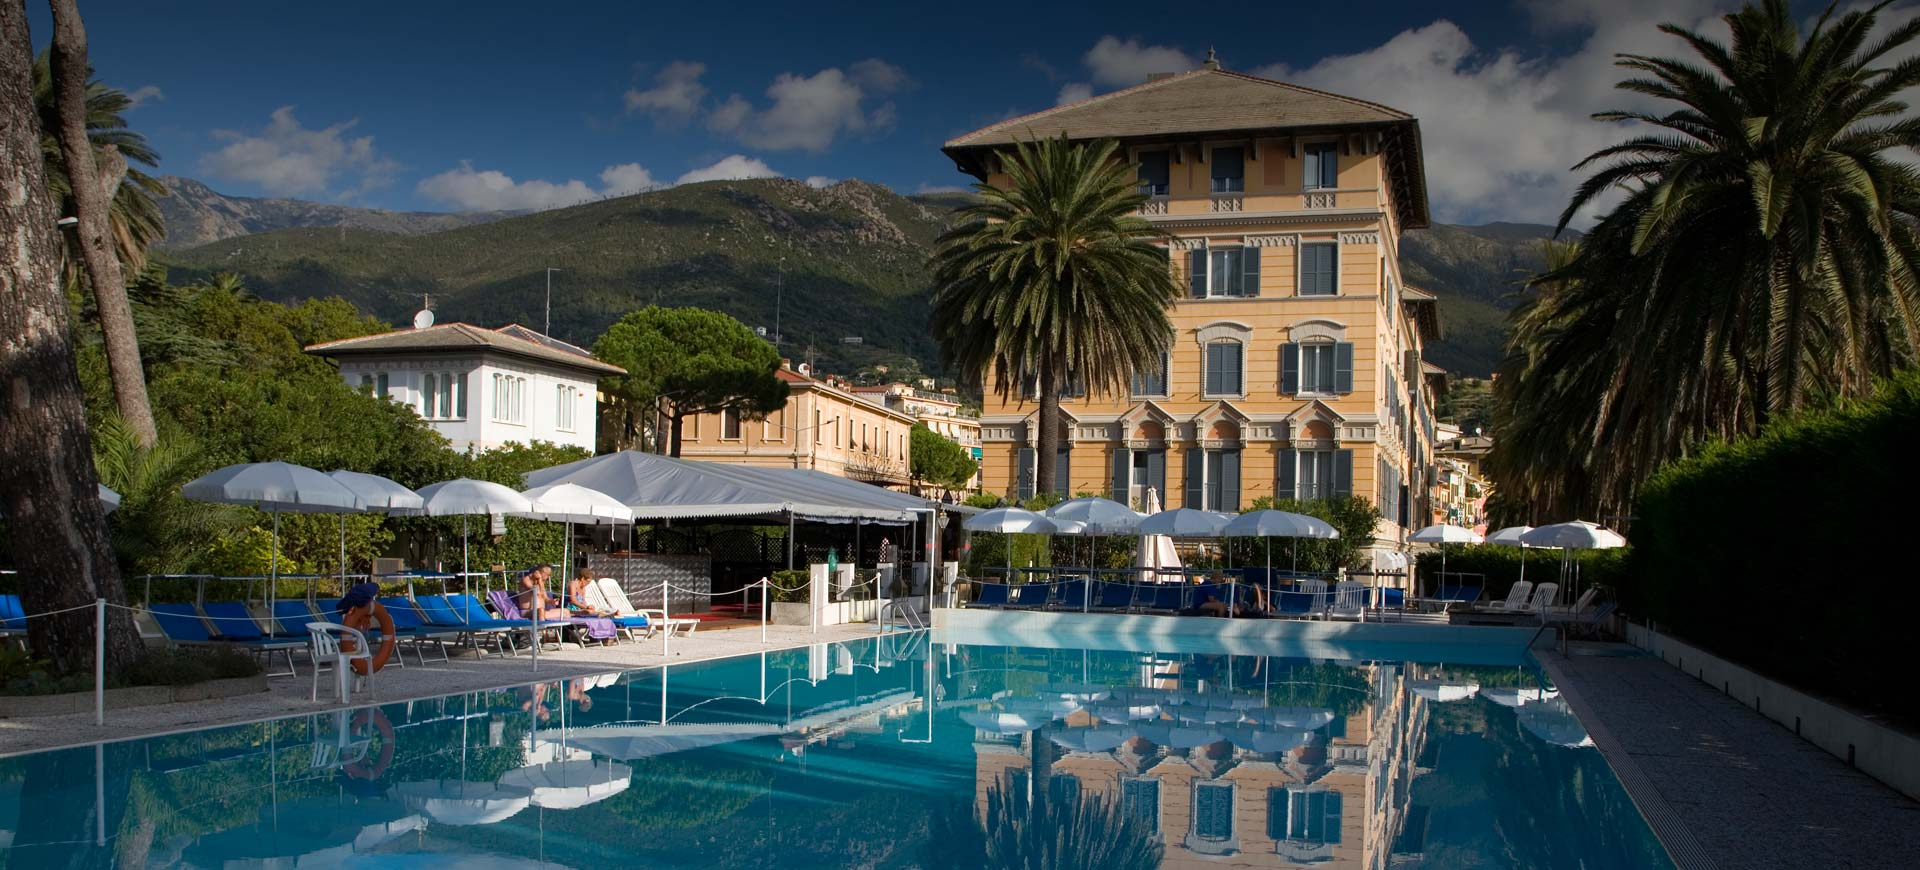 Piscine Grand Hotel Arenzano